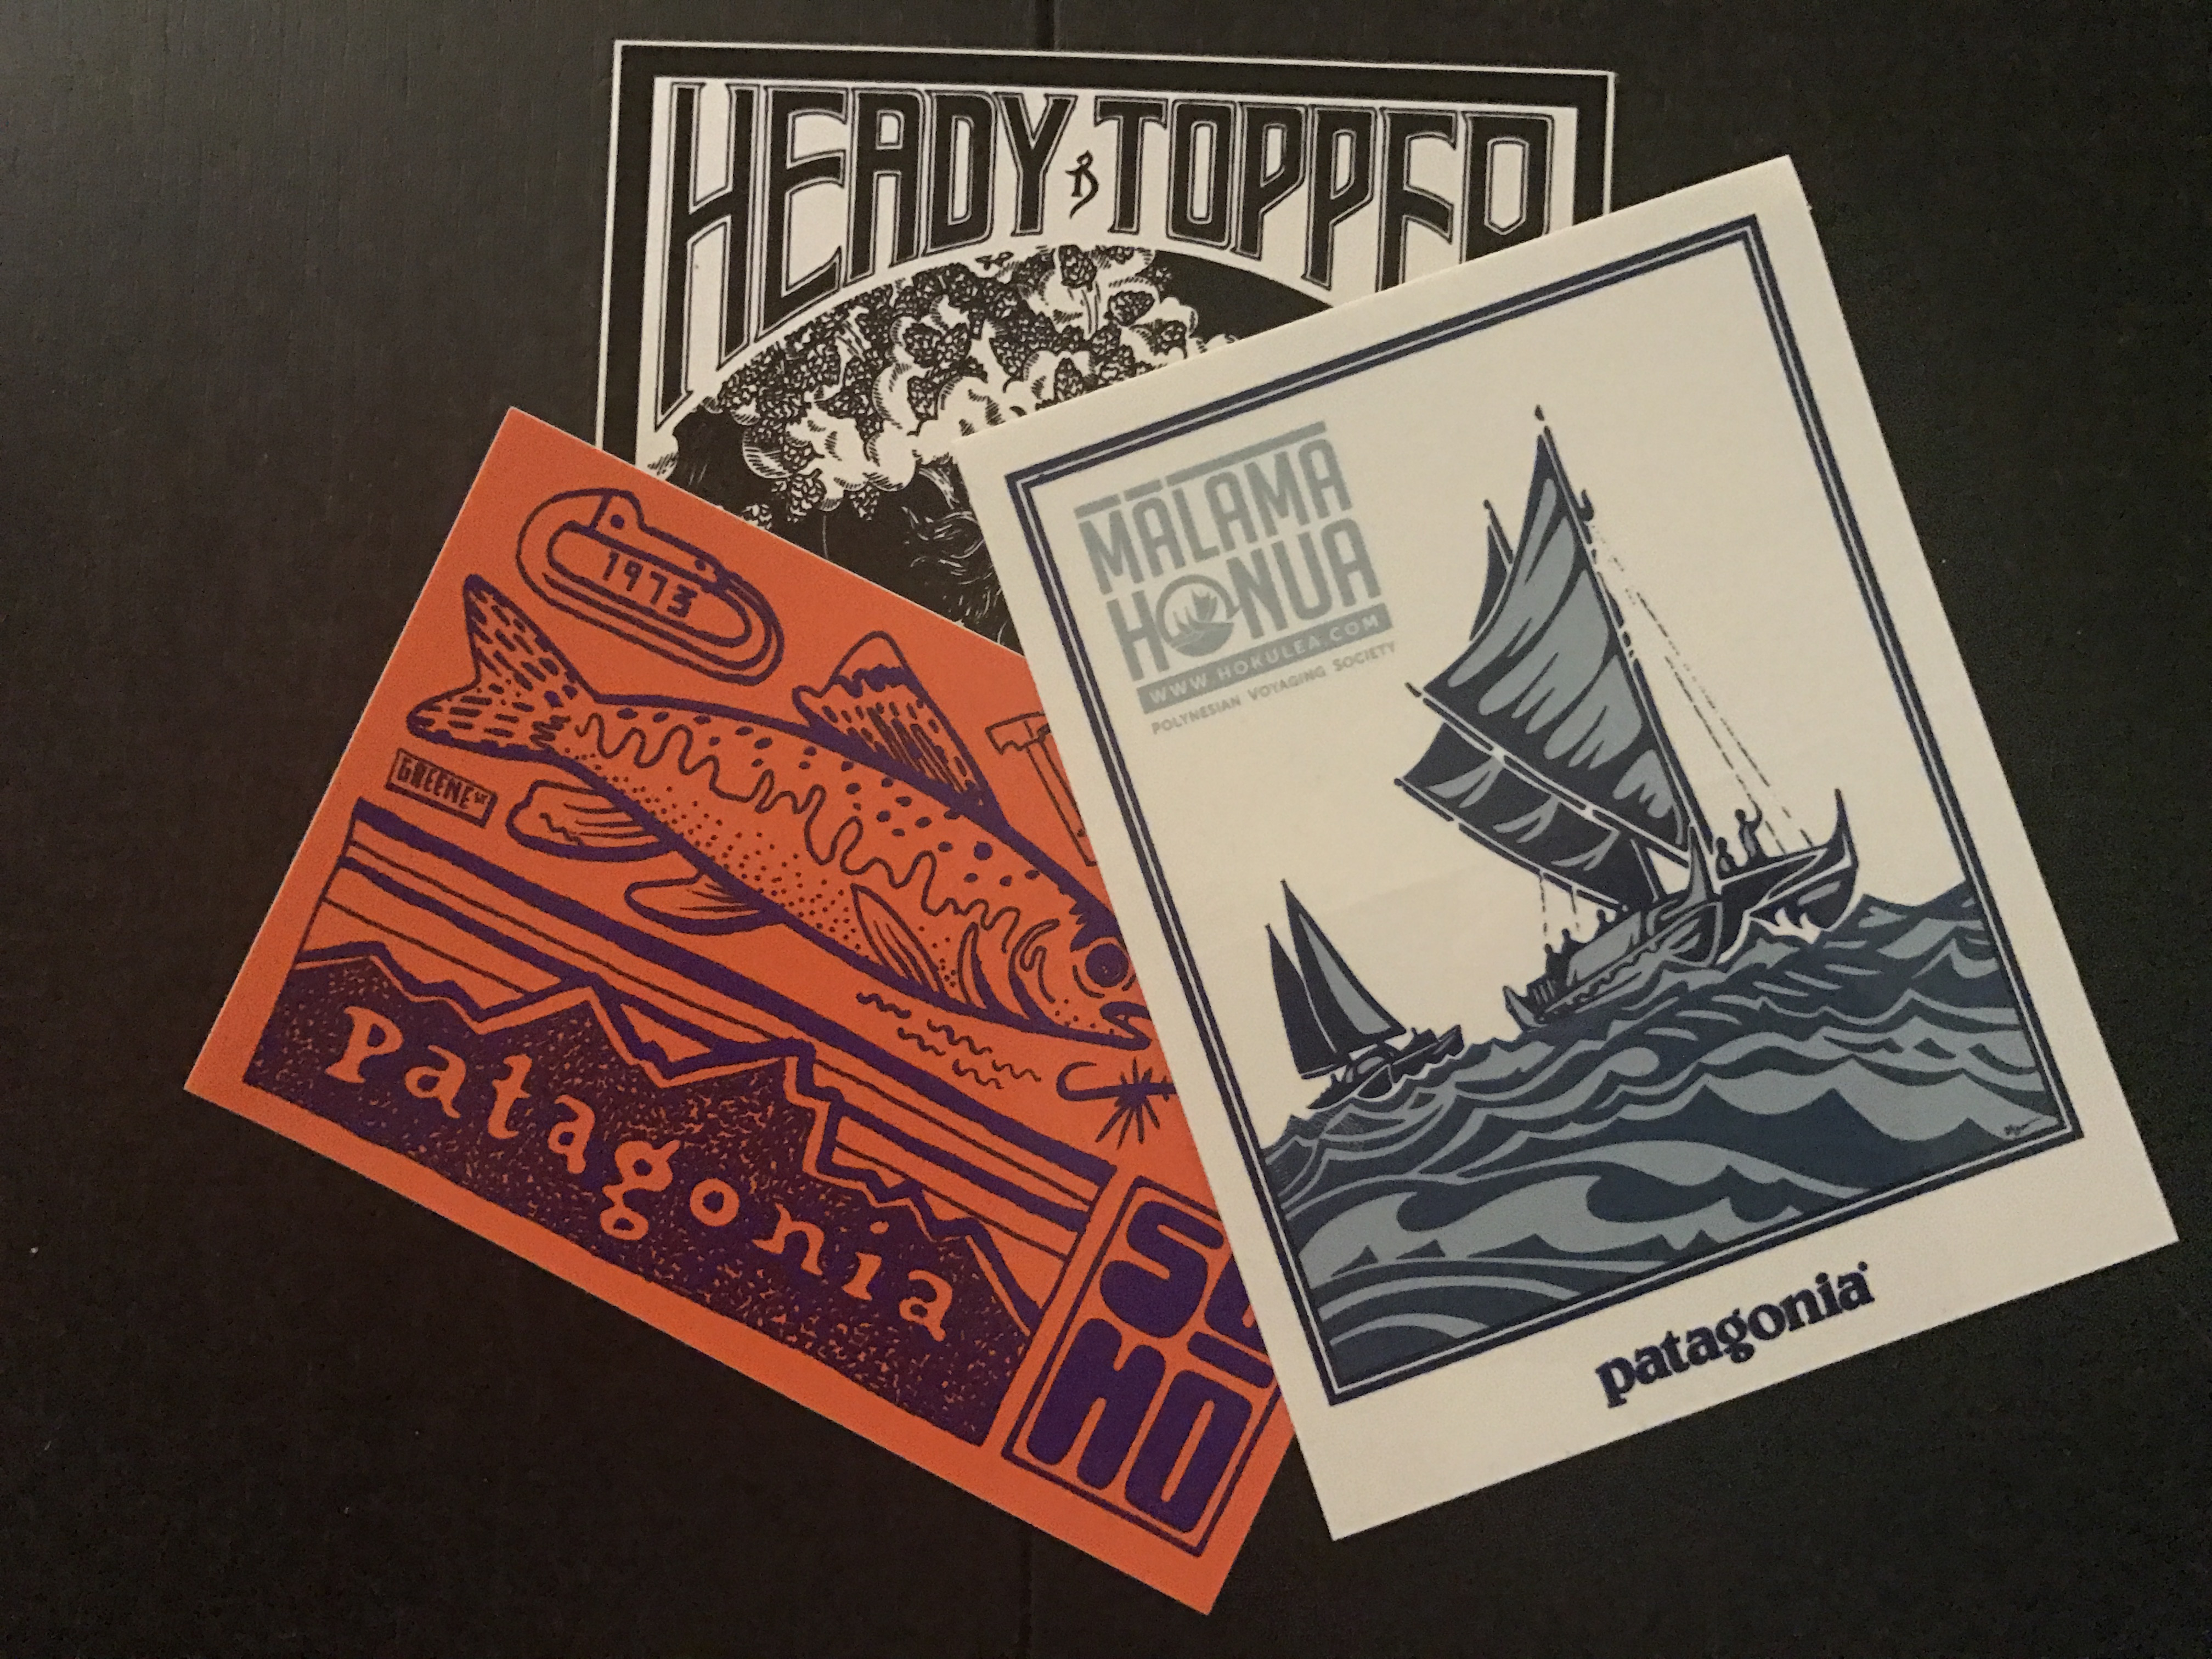 Patagonia Stickers – Patagonia Fan Boy